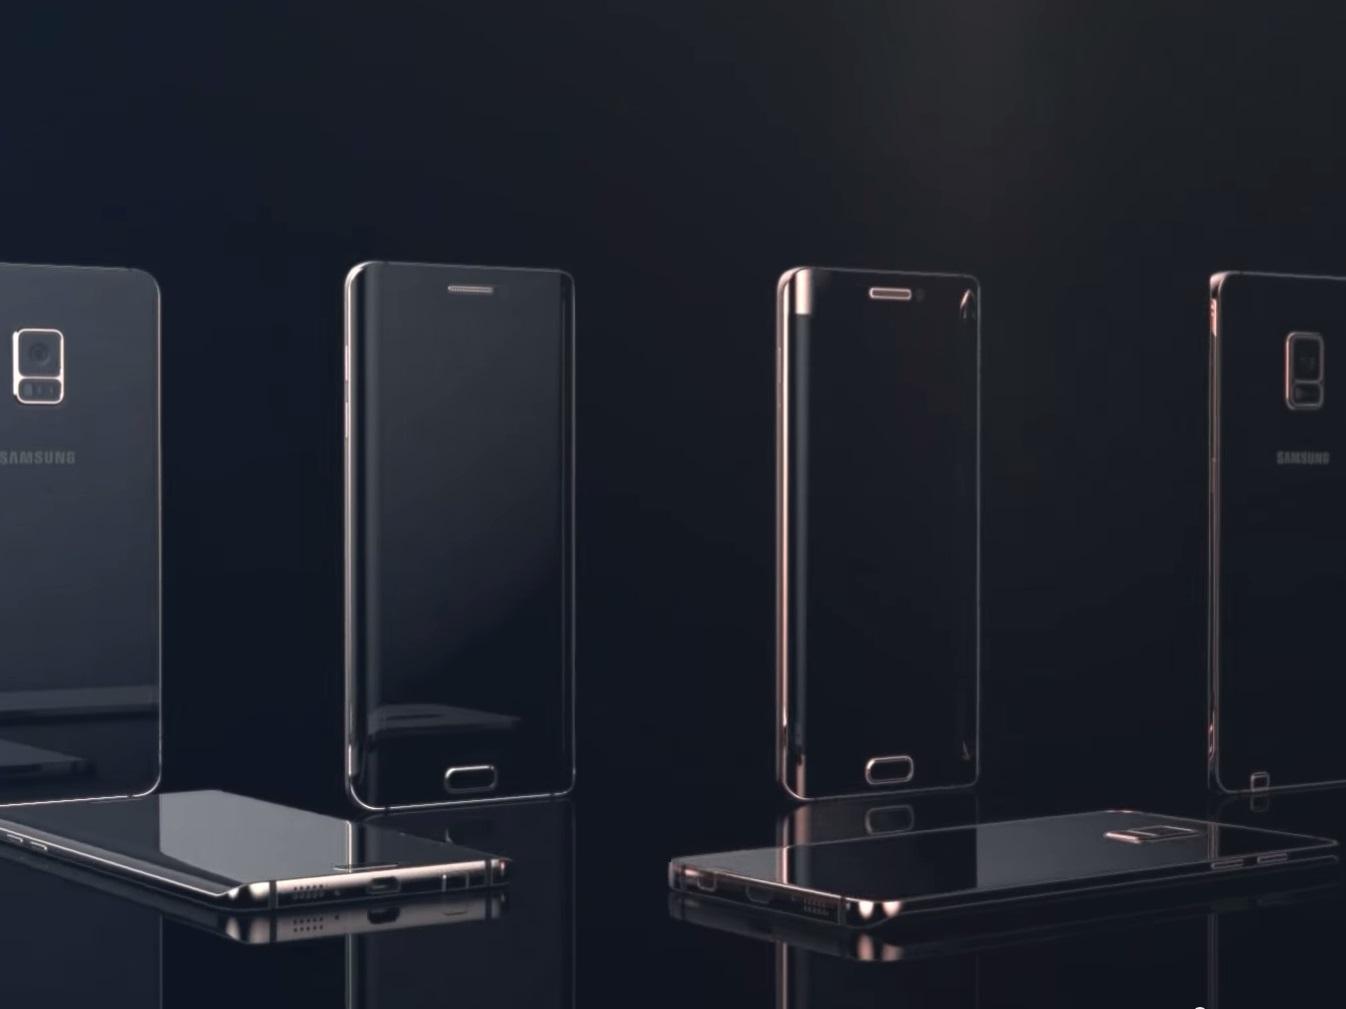 concept Galaxy Note 5 Edge